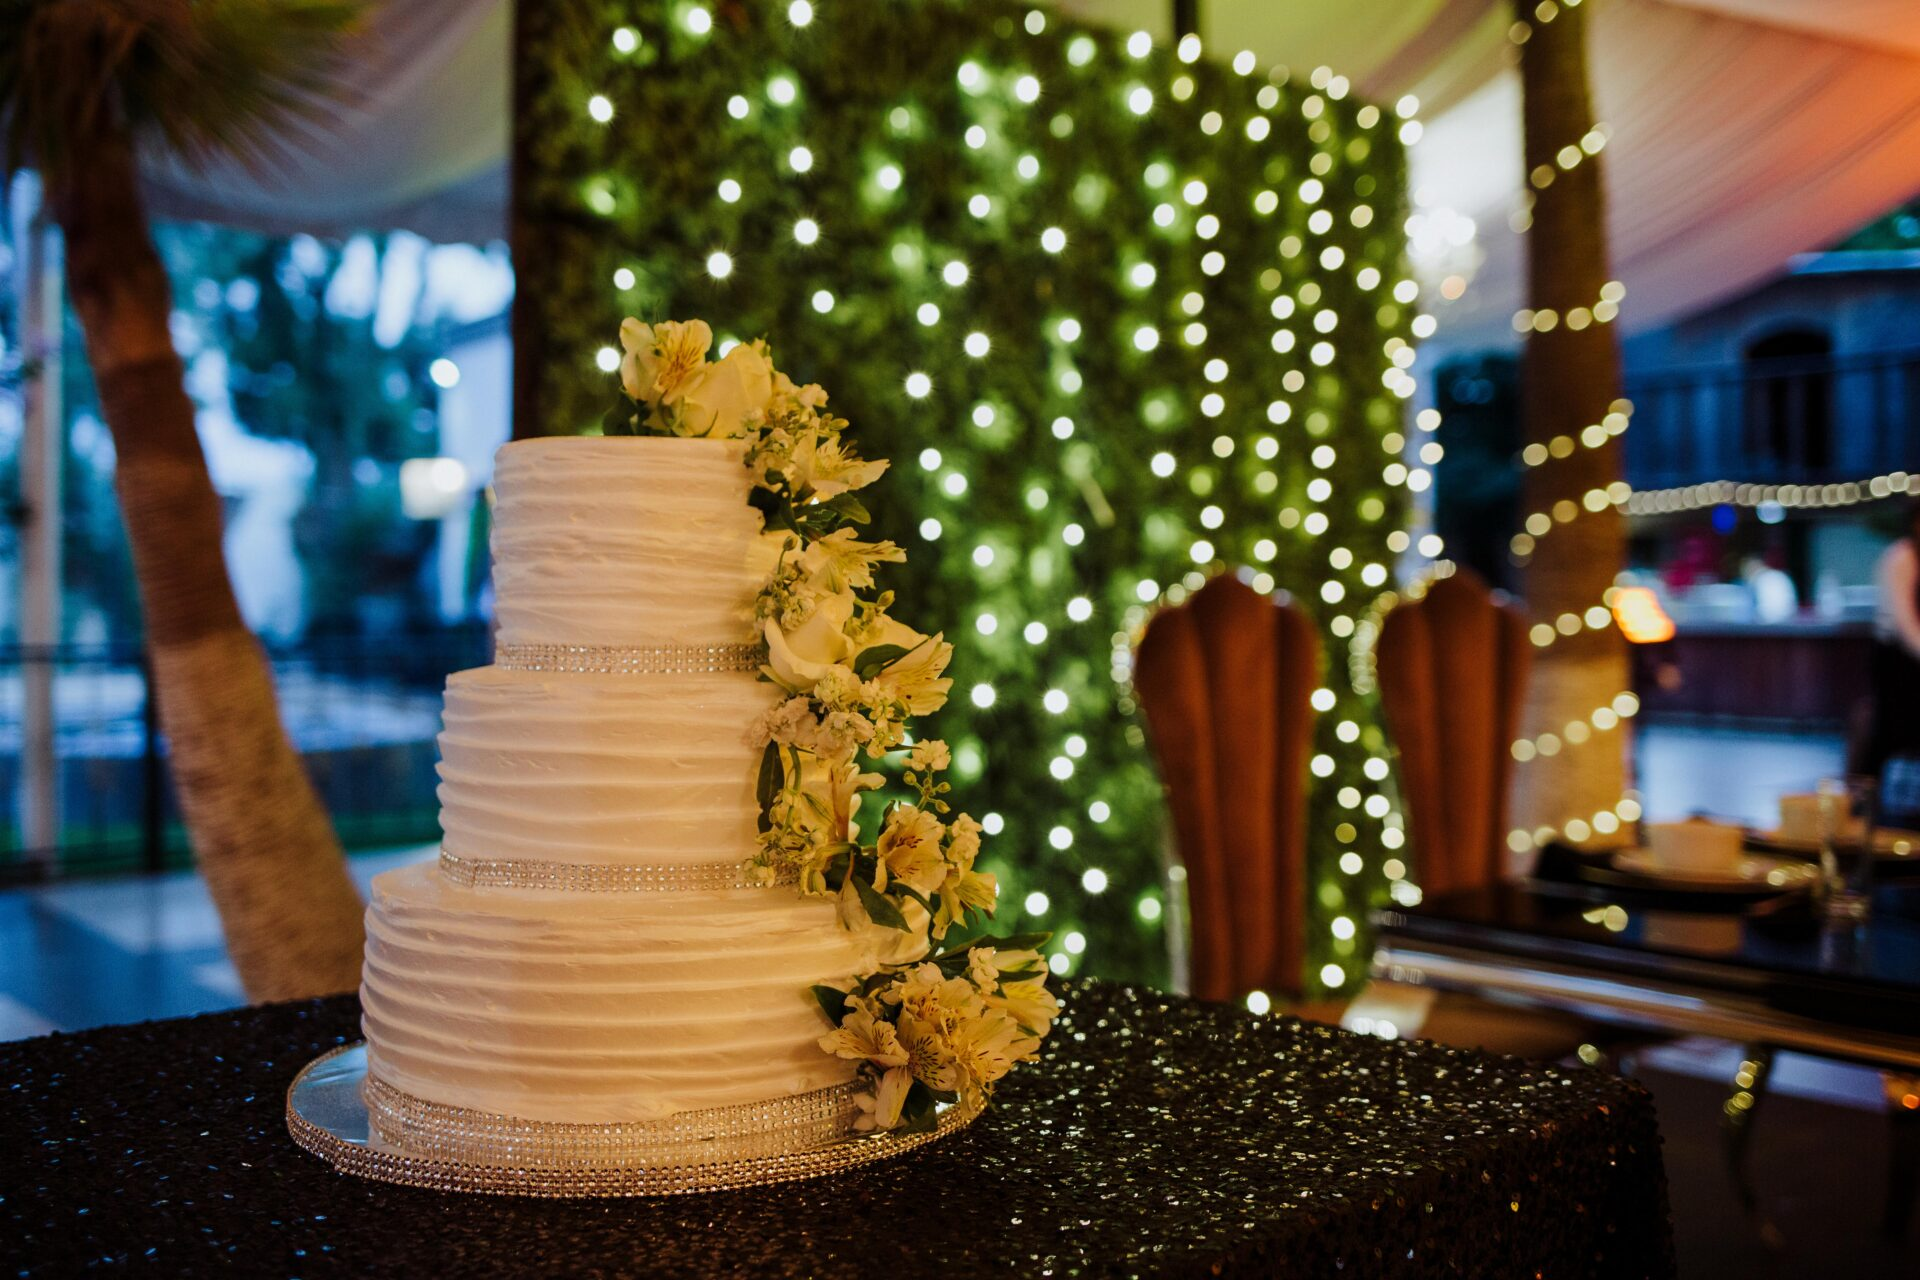 javier_noriega_fotografo_bodas_torreon_coahuila_zacatecas_wedding_photographer48a